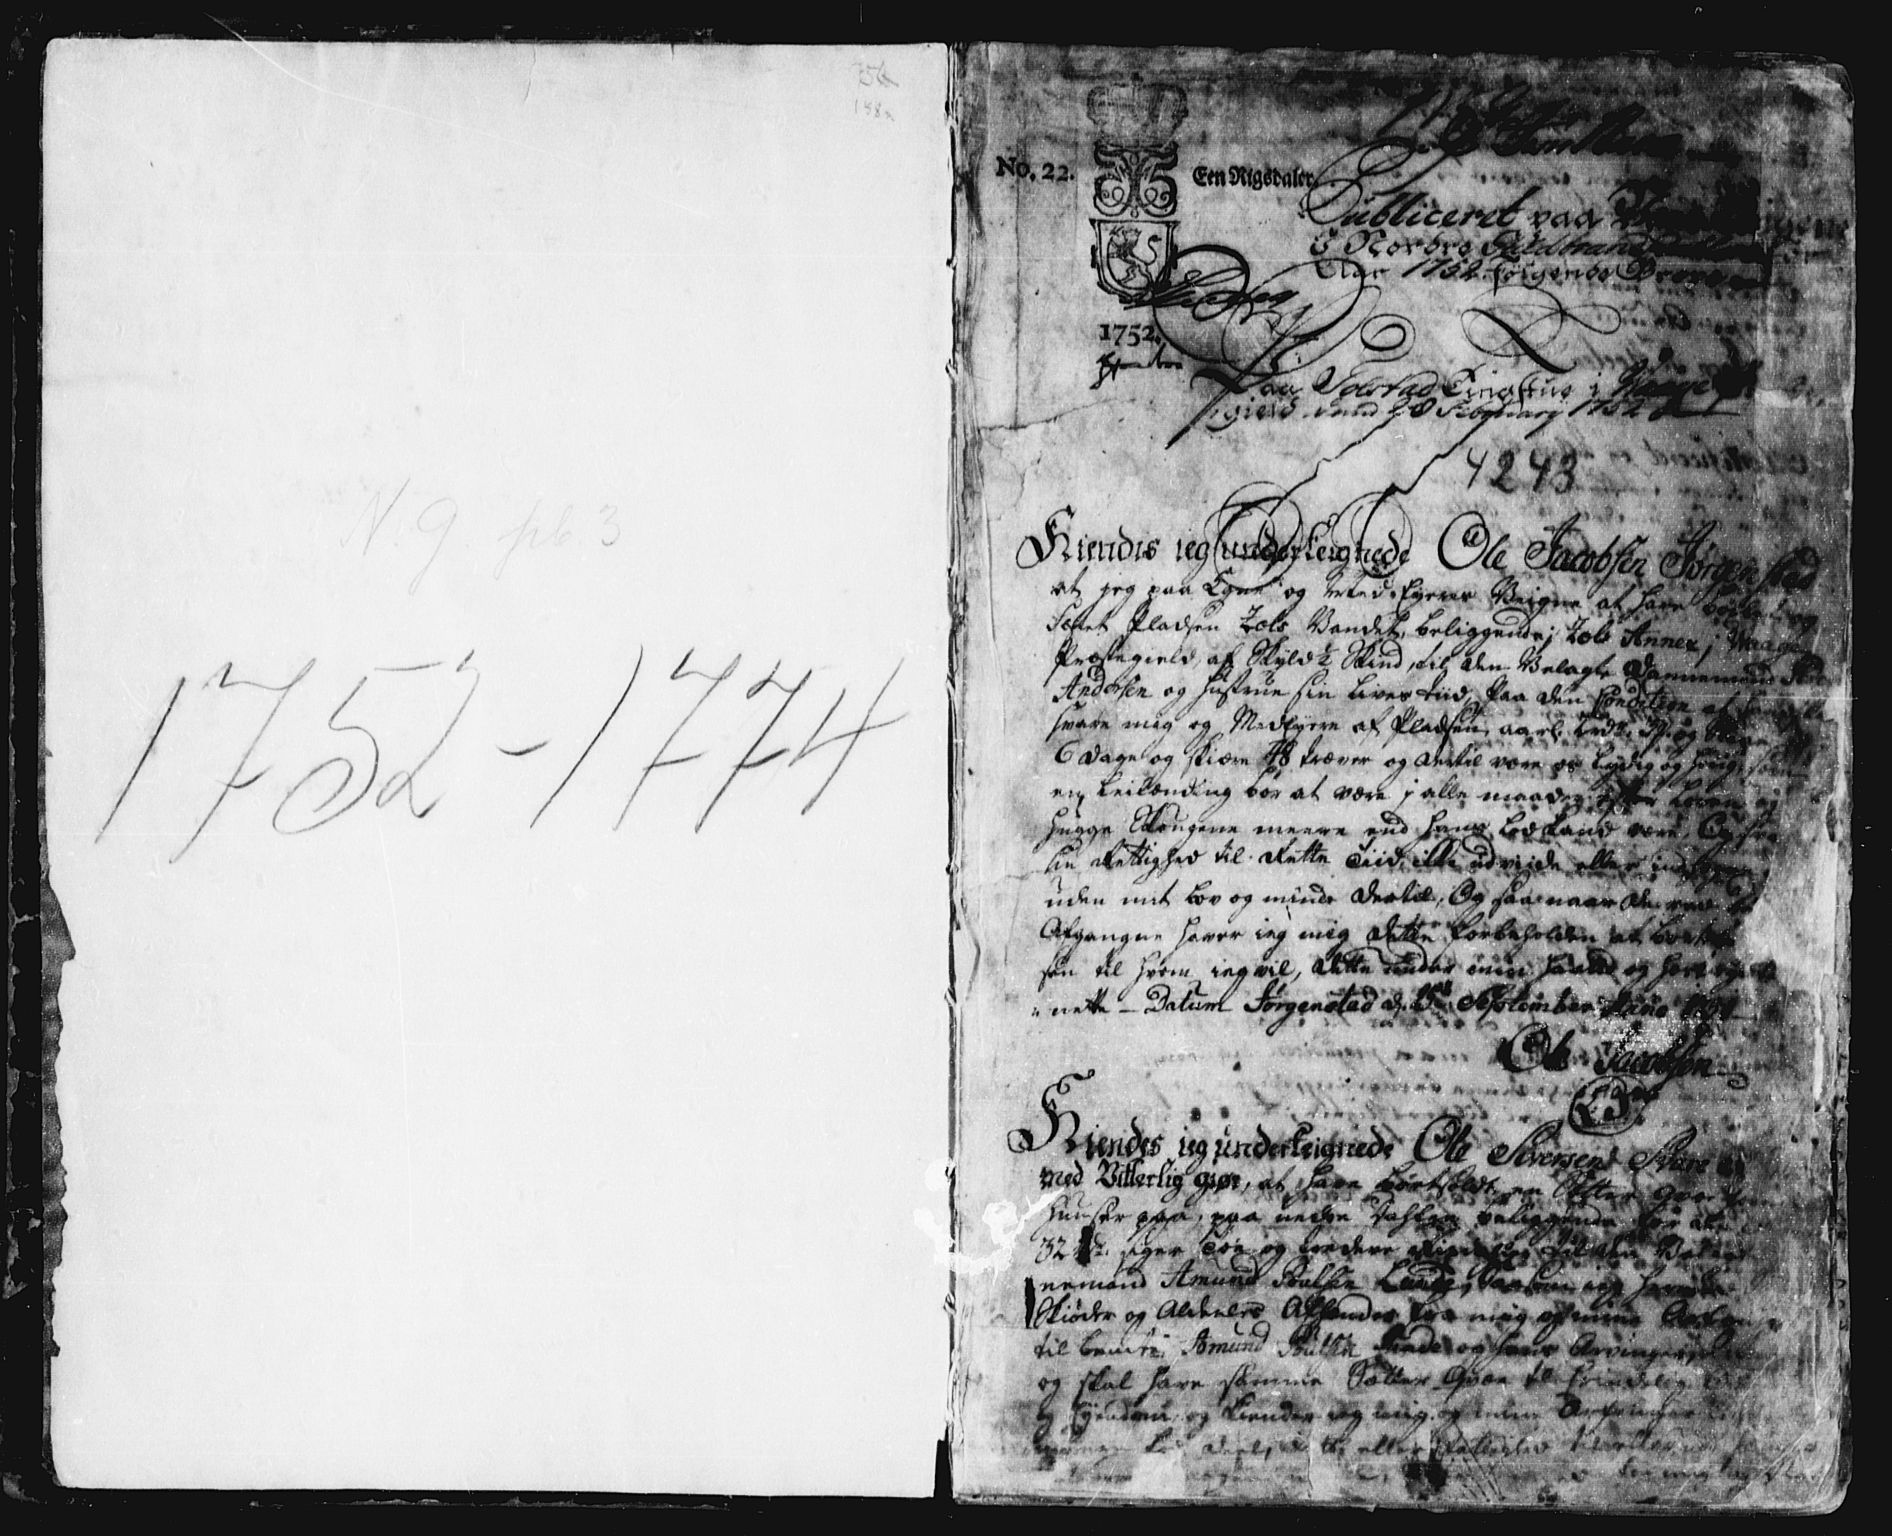 SAH, Nord-Gudbrandsdal tingrett, H/Hb/Hba/L0002: Pantebok nr. 2, 1752-1774, s. 1